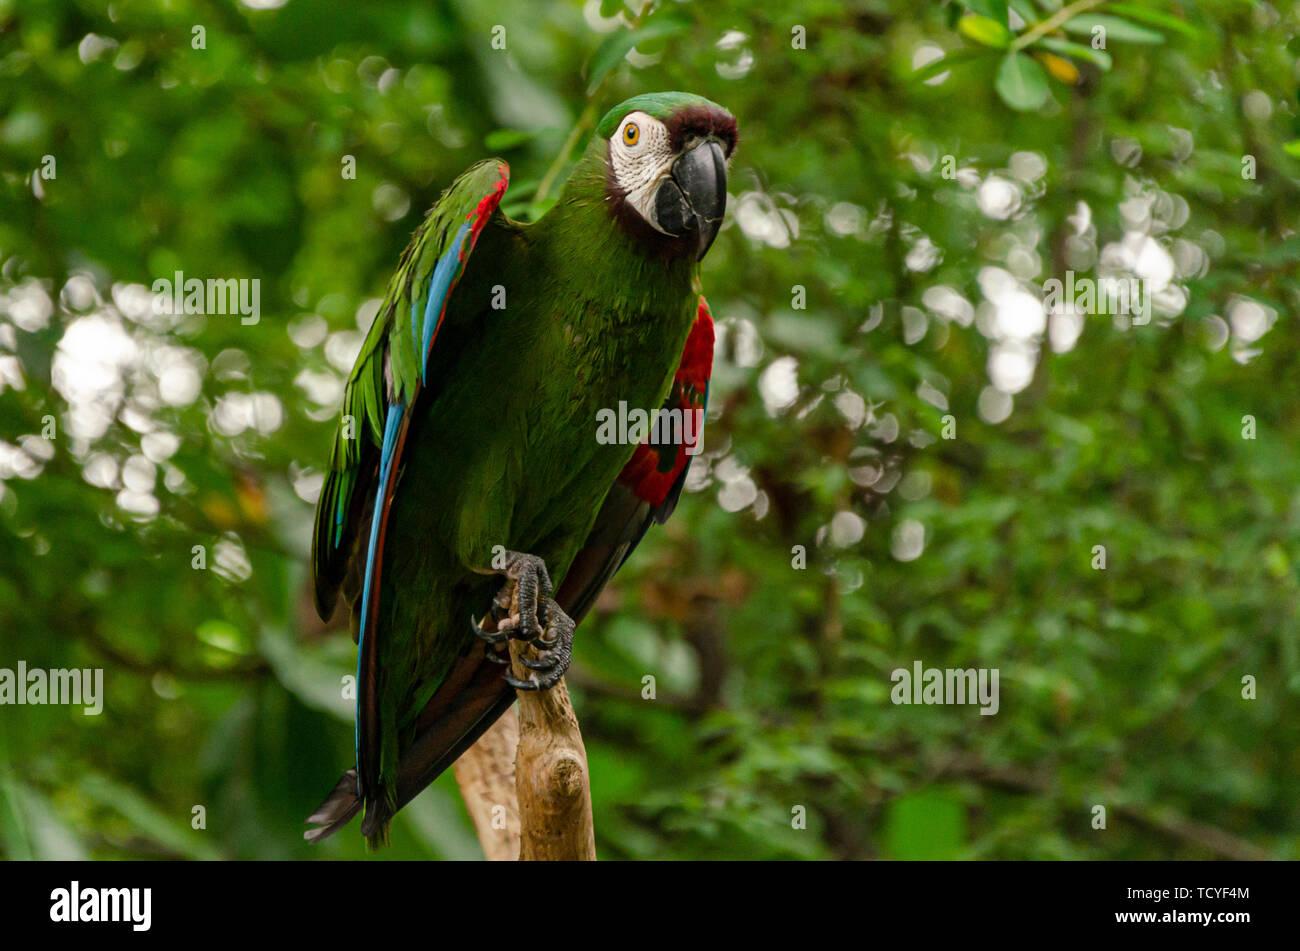 parrot with green plumage in the Ecuadorian jungle.Guayaquil, Ecuador Stock Photo